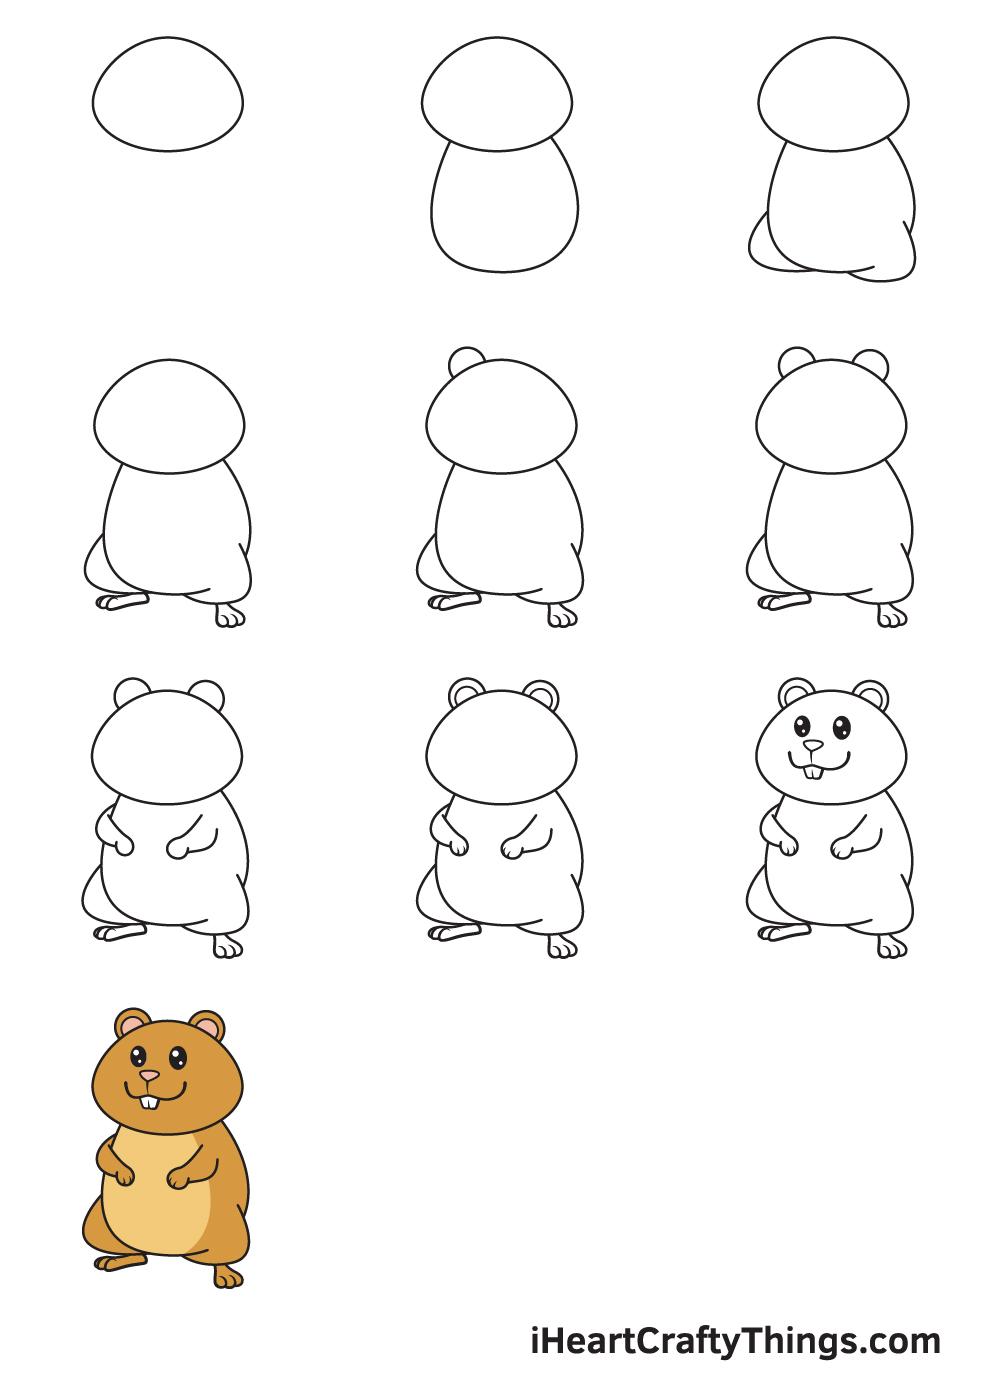 drawing hamster in 9 easy steps